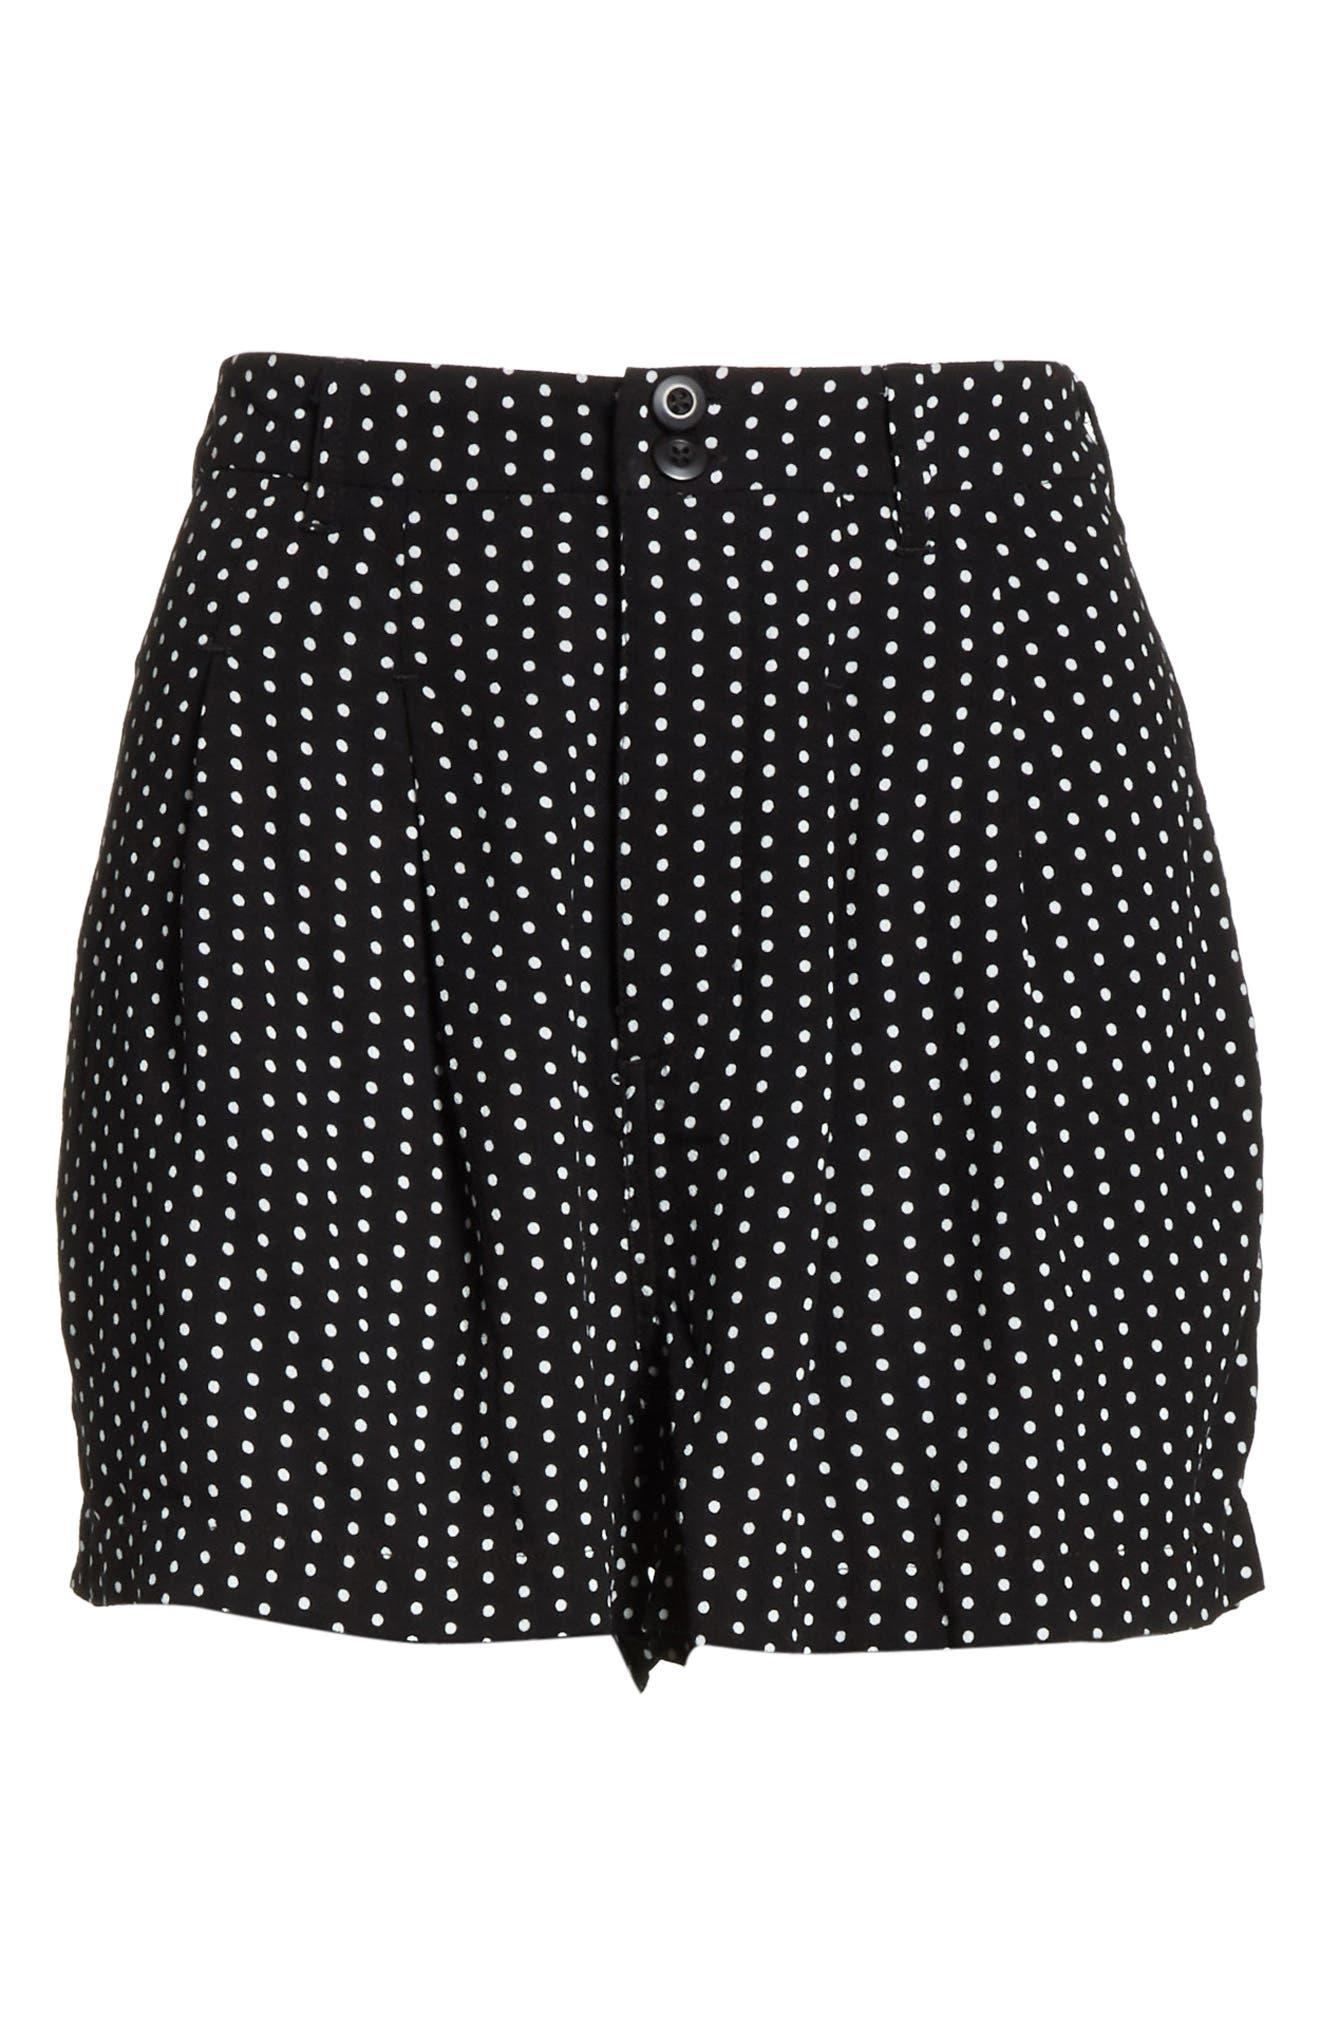 Magdalene Polka Dot Pleated Shorts,                             Alternate thumbnail 6, color,